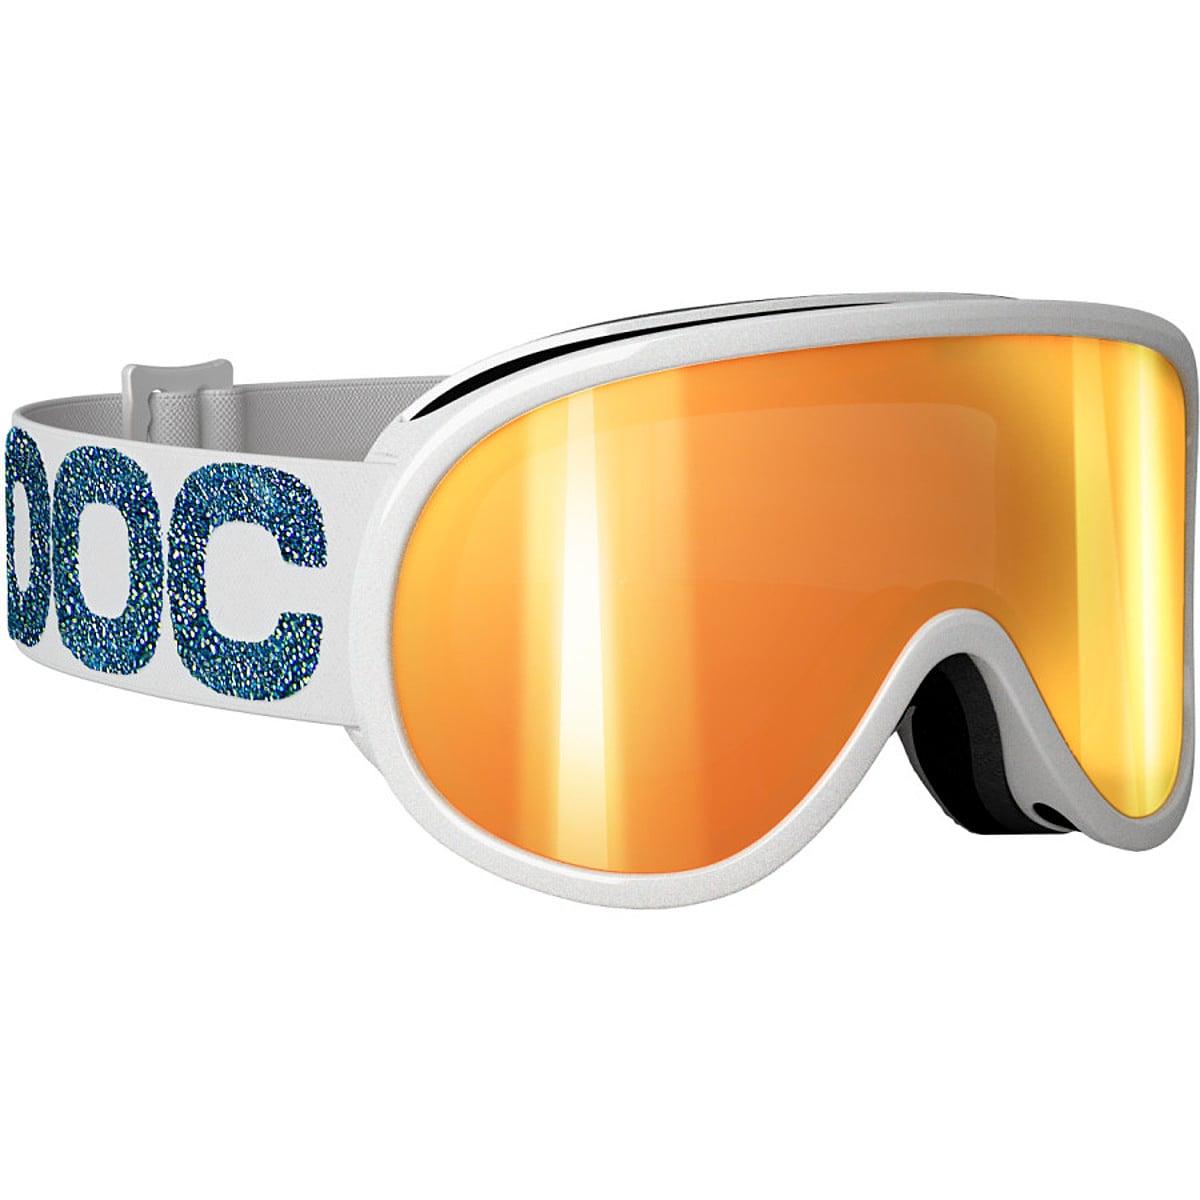 photo: POC Retina Lens goggle lens